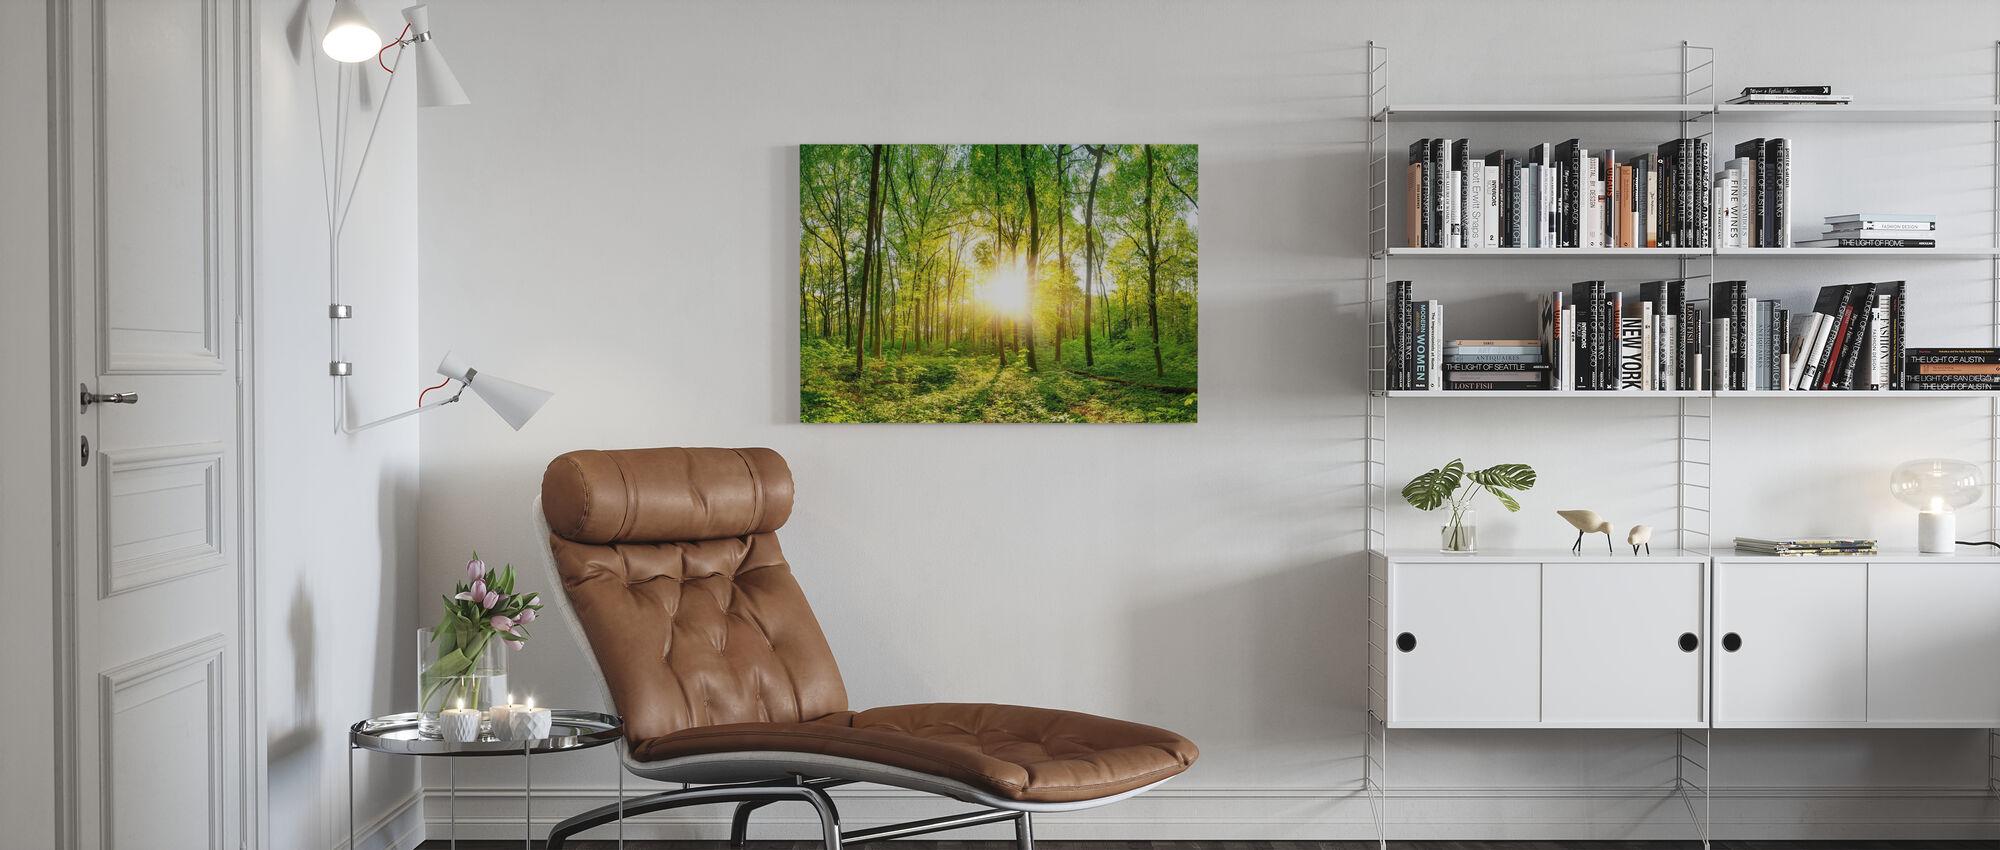 Skog soluppgång - Canvastavla - Vardagsrum